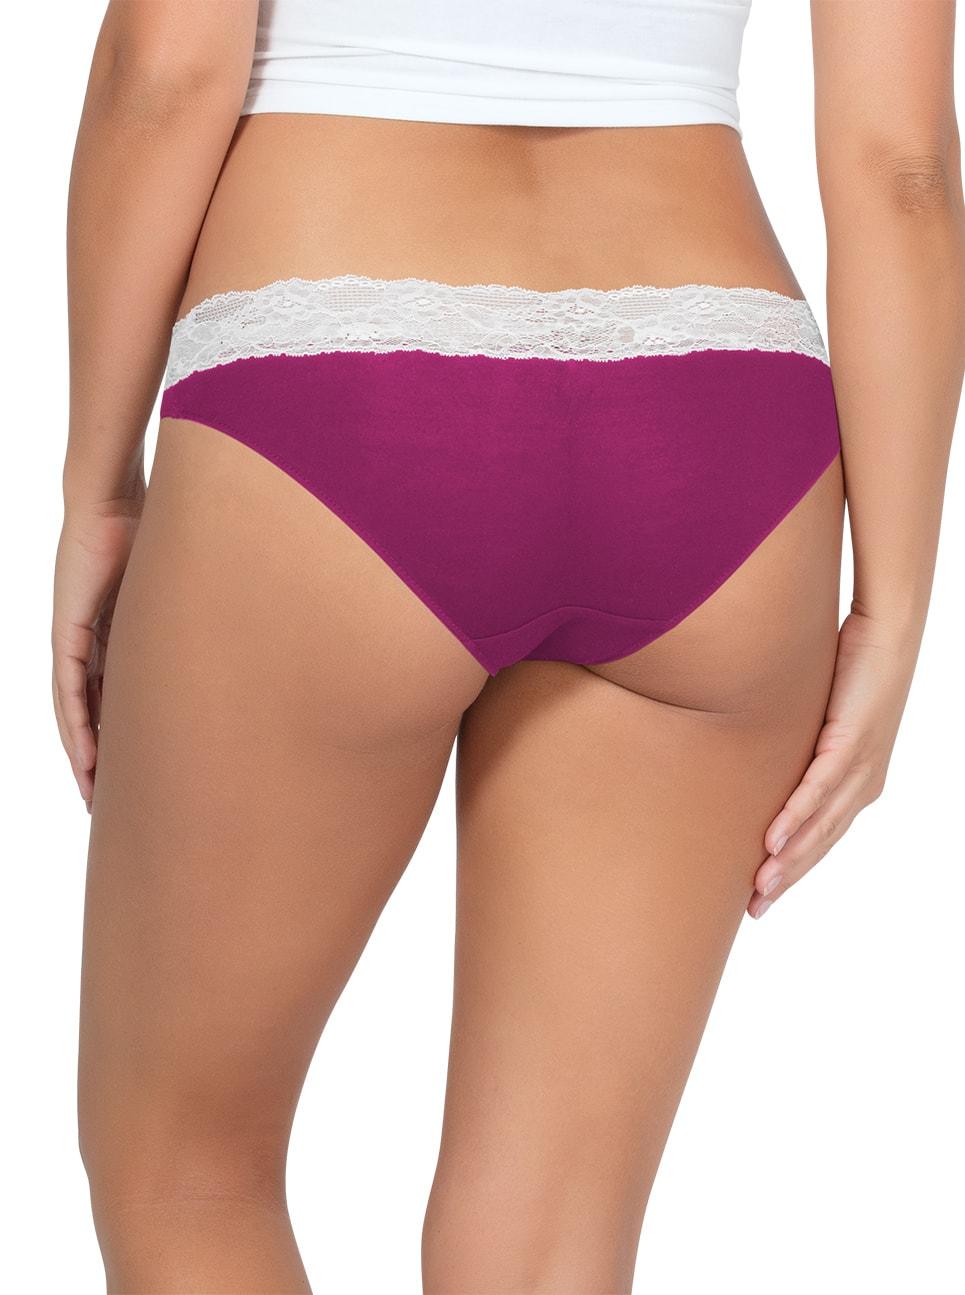 PARFAIT ParfaitPanty SoEssential BikiniPP303 WildPinkIvory Back - Panty So Essential Bikini- Wild Pink - PP303